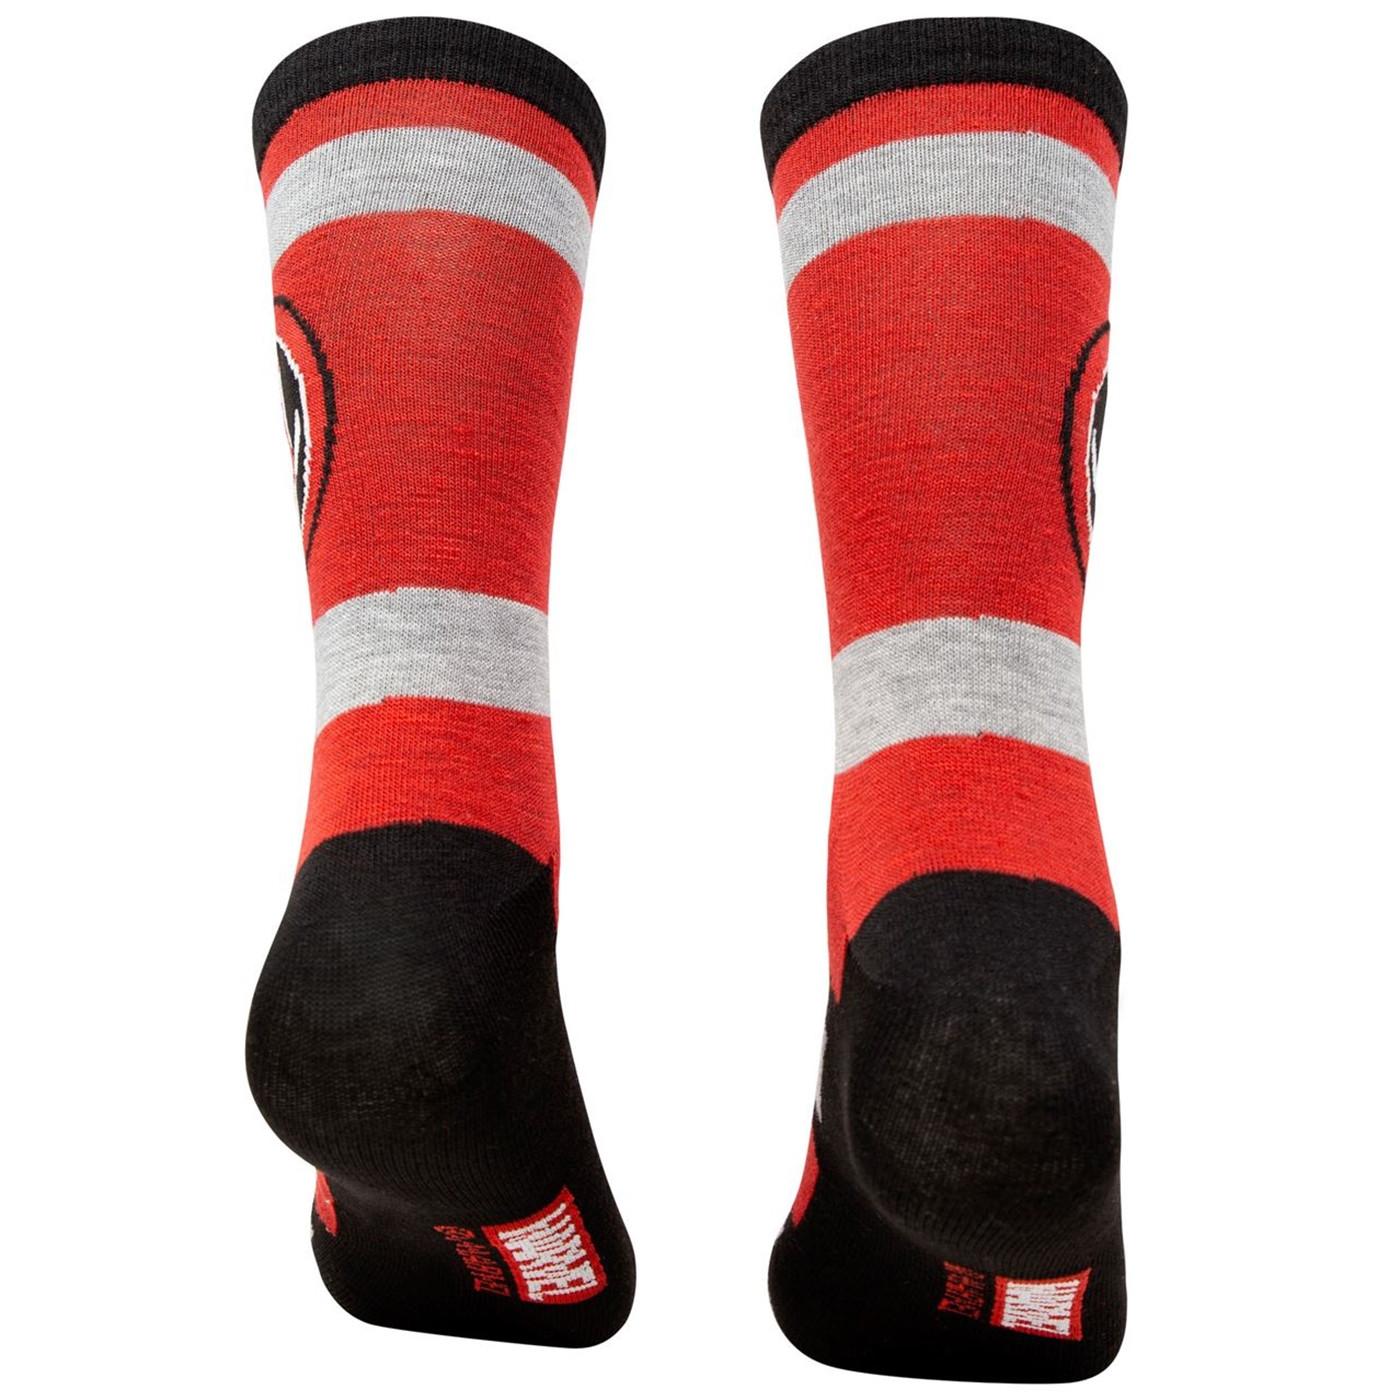 Deadpool Costume and Symbols Men's 2-Pack Crew Socks